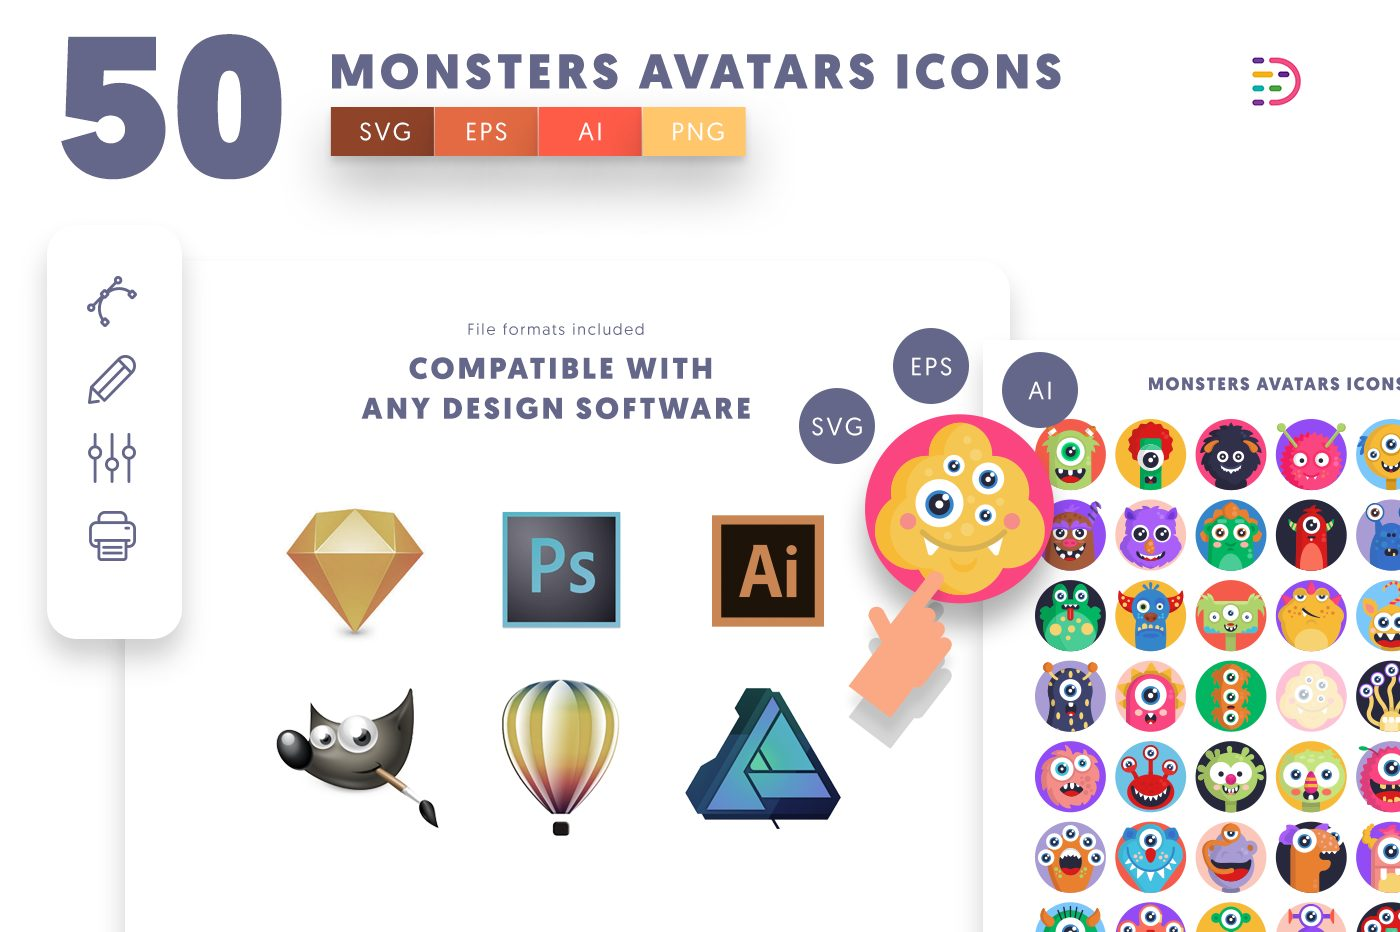 full vector 50 Monsters Avatars Icons EPS, SVG, PNG